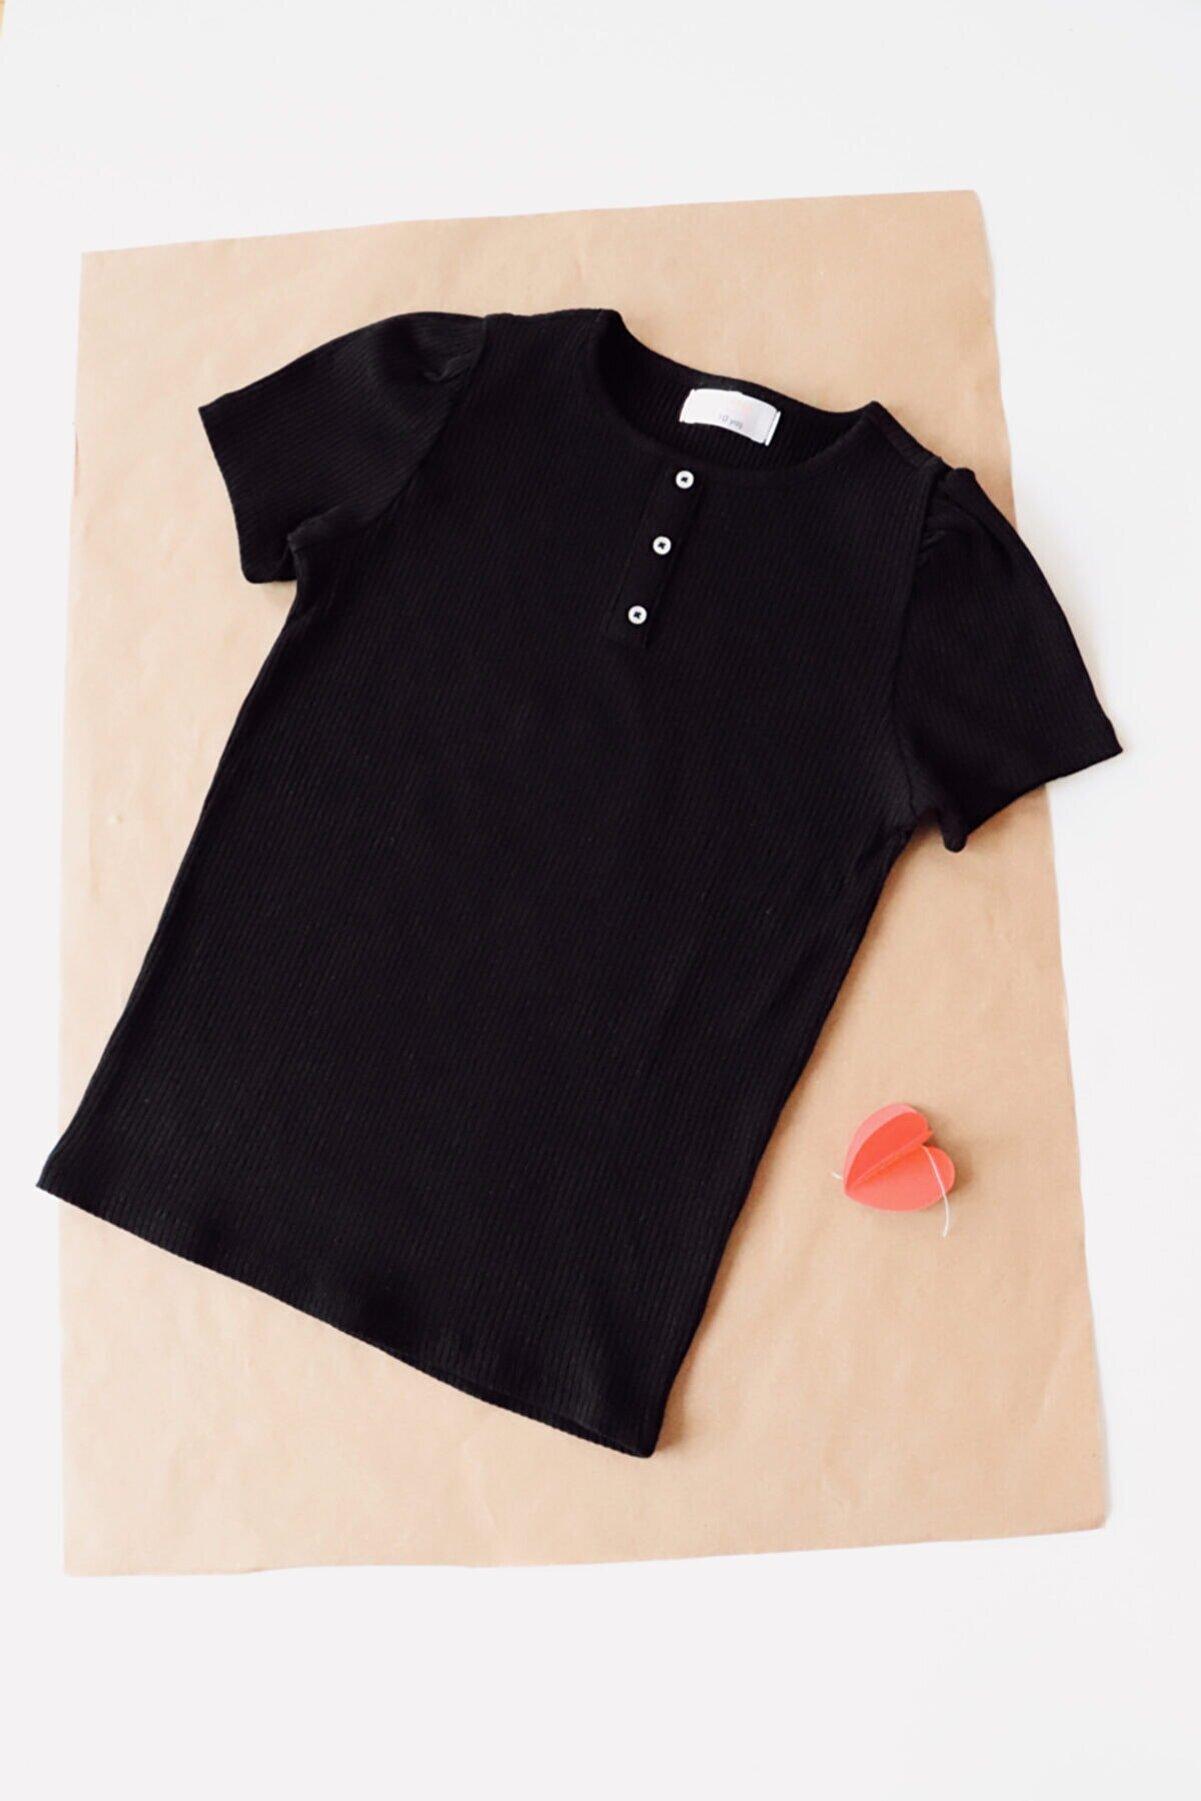 CARNA DESİGN Çocuk Siyah Kısa Kollu T-shirt